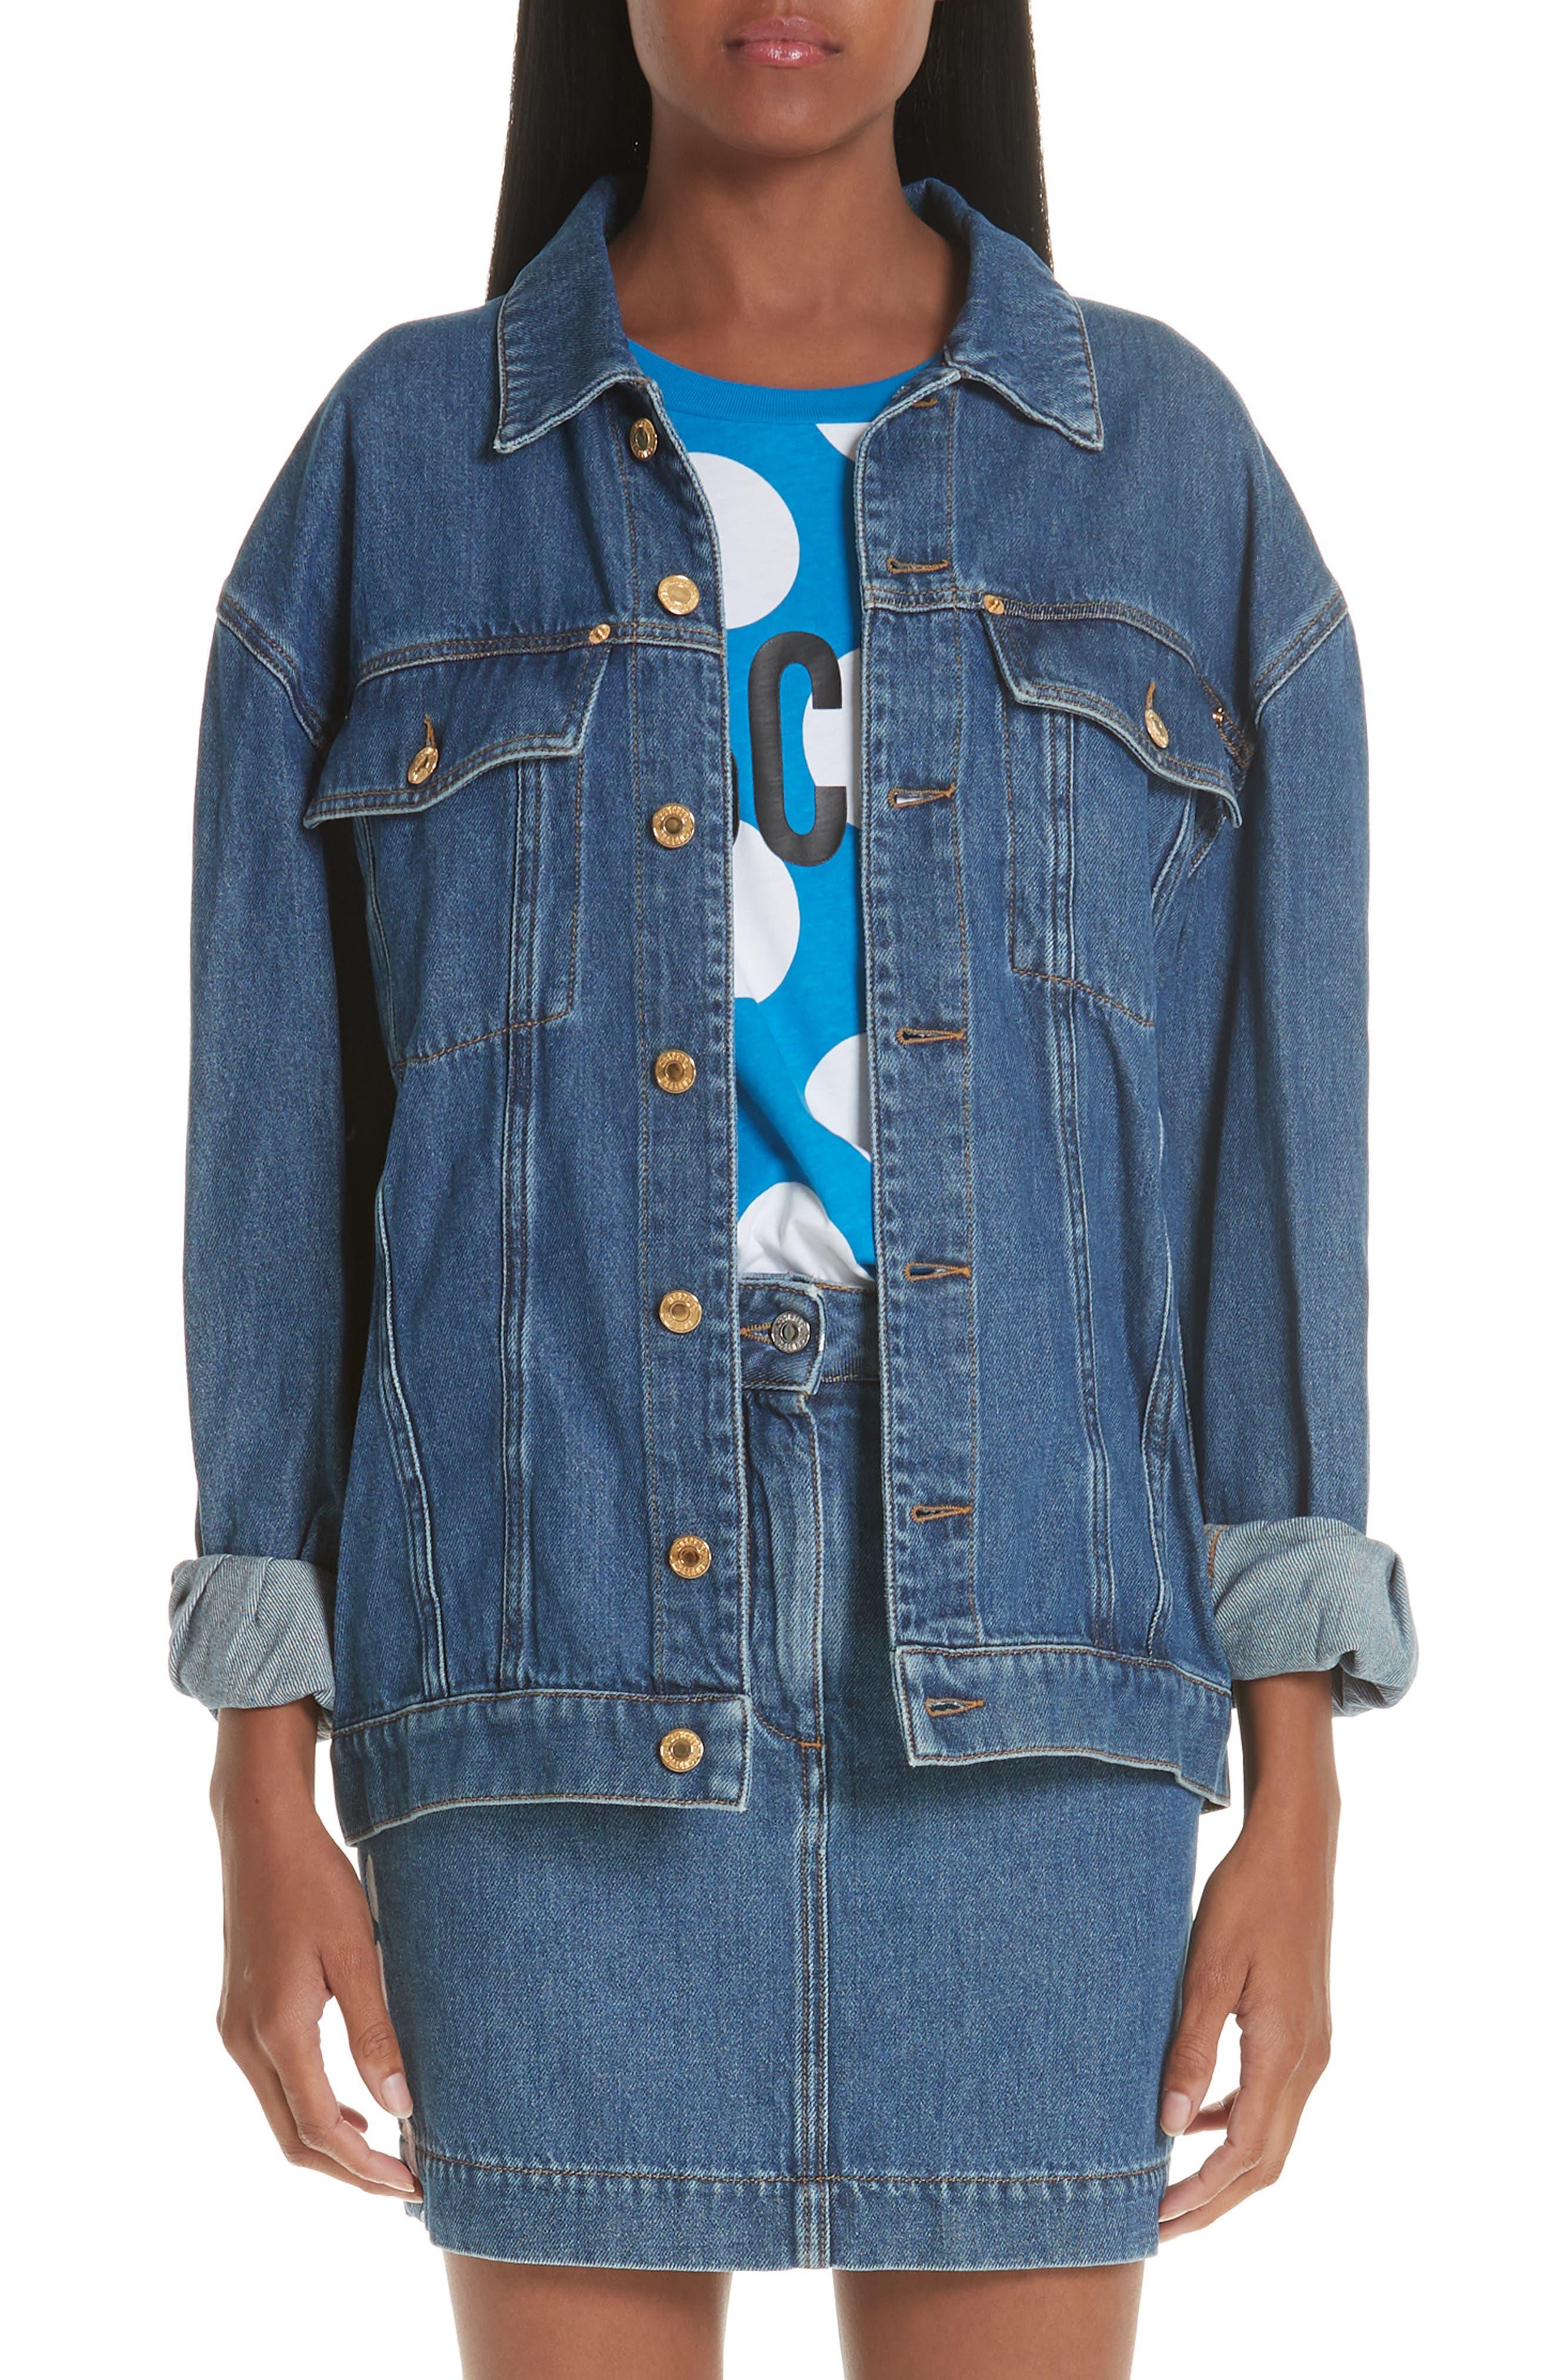 MOSCHINO Sequin Teddy Denim Jacket, Main, color, DENIM